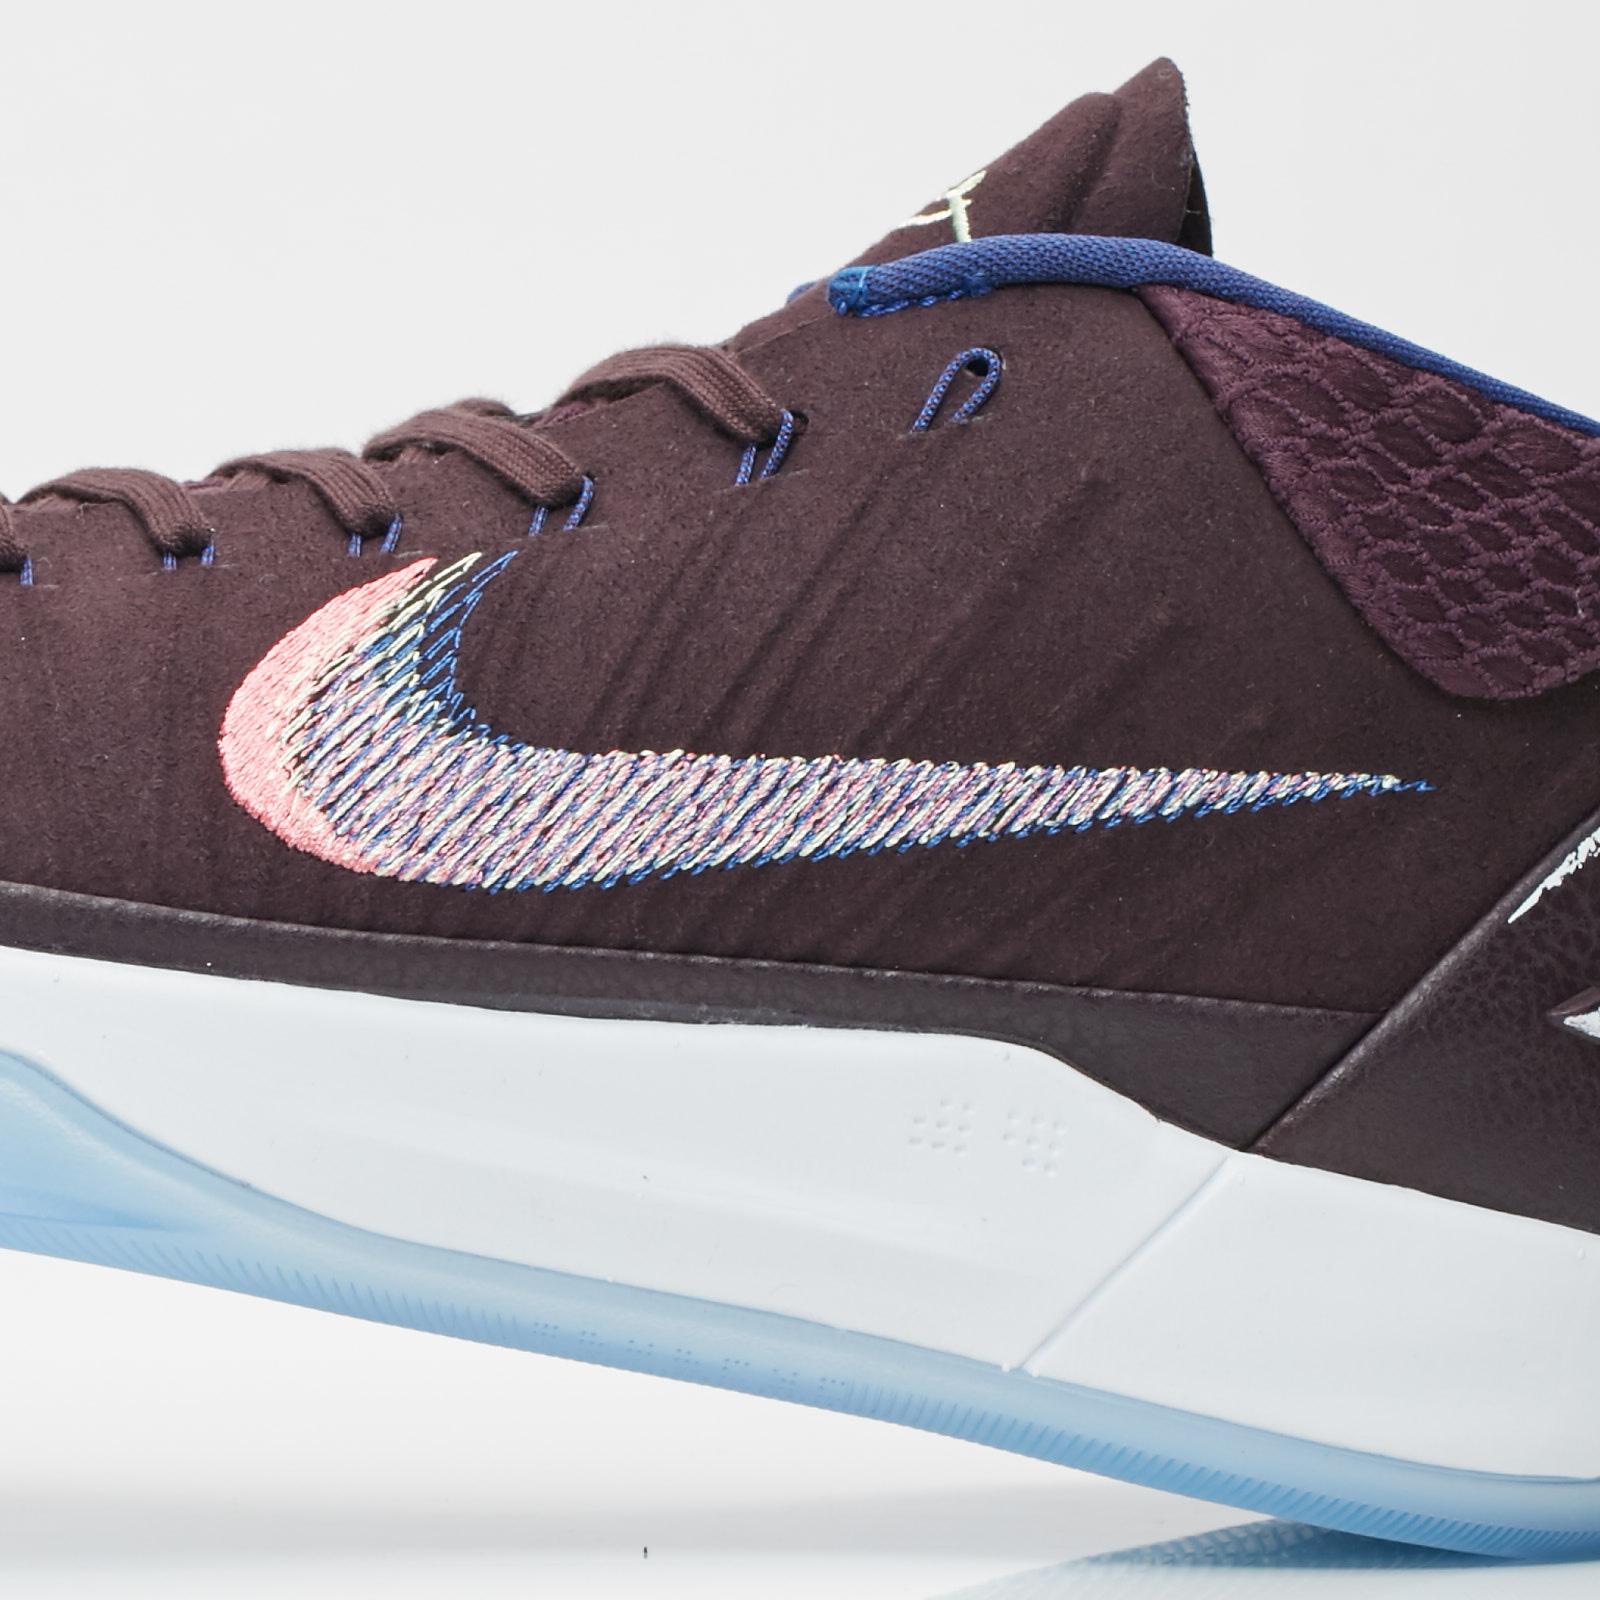 finest selection f0ba5 64f08 ... Nike Basketball Kobe AD